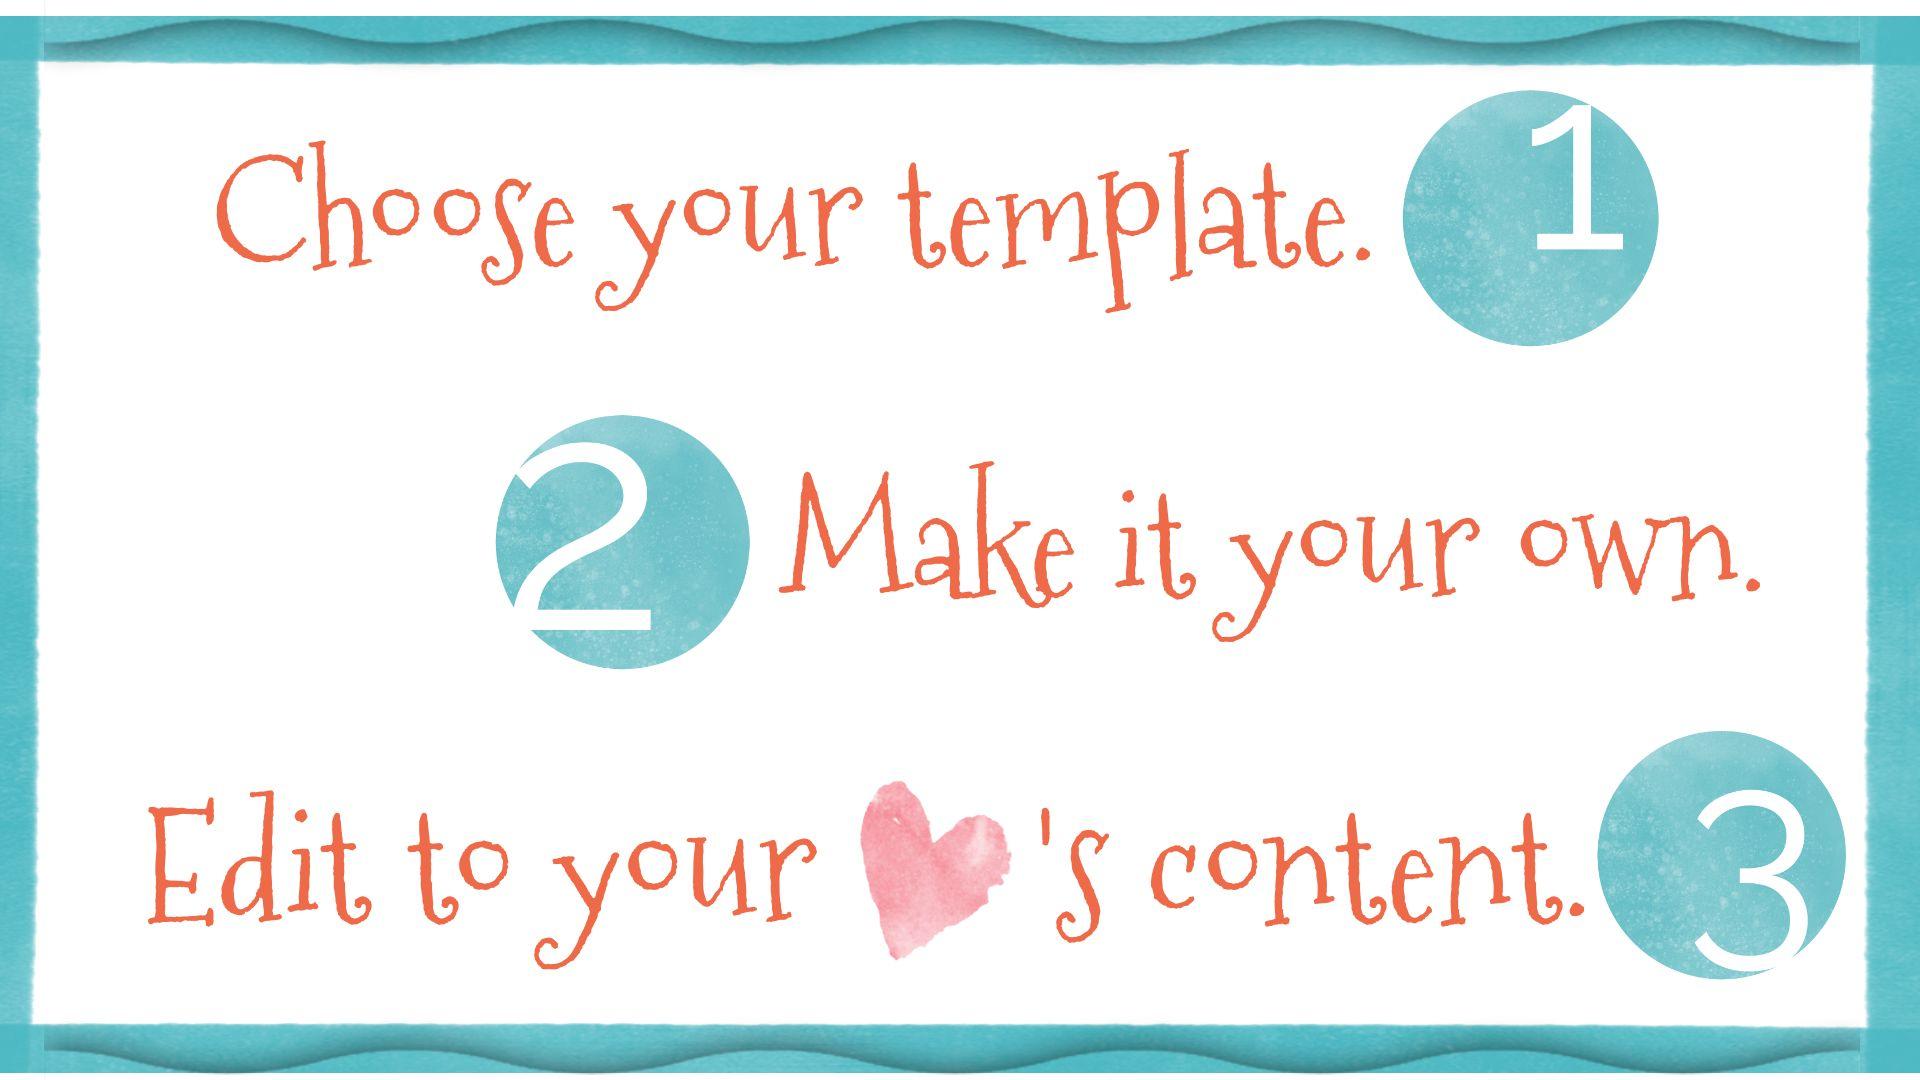 Introducing Buncee Templates - Buncee BlogBuncee Blog